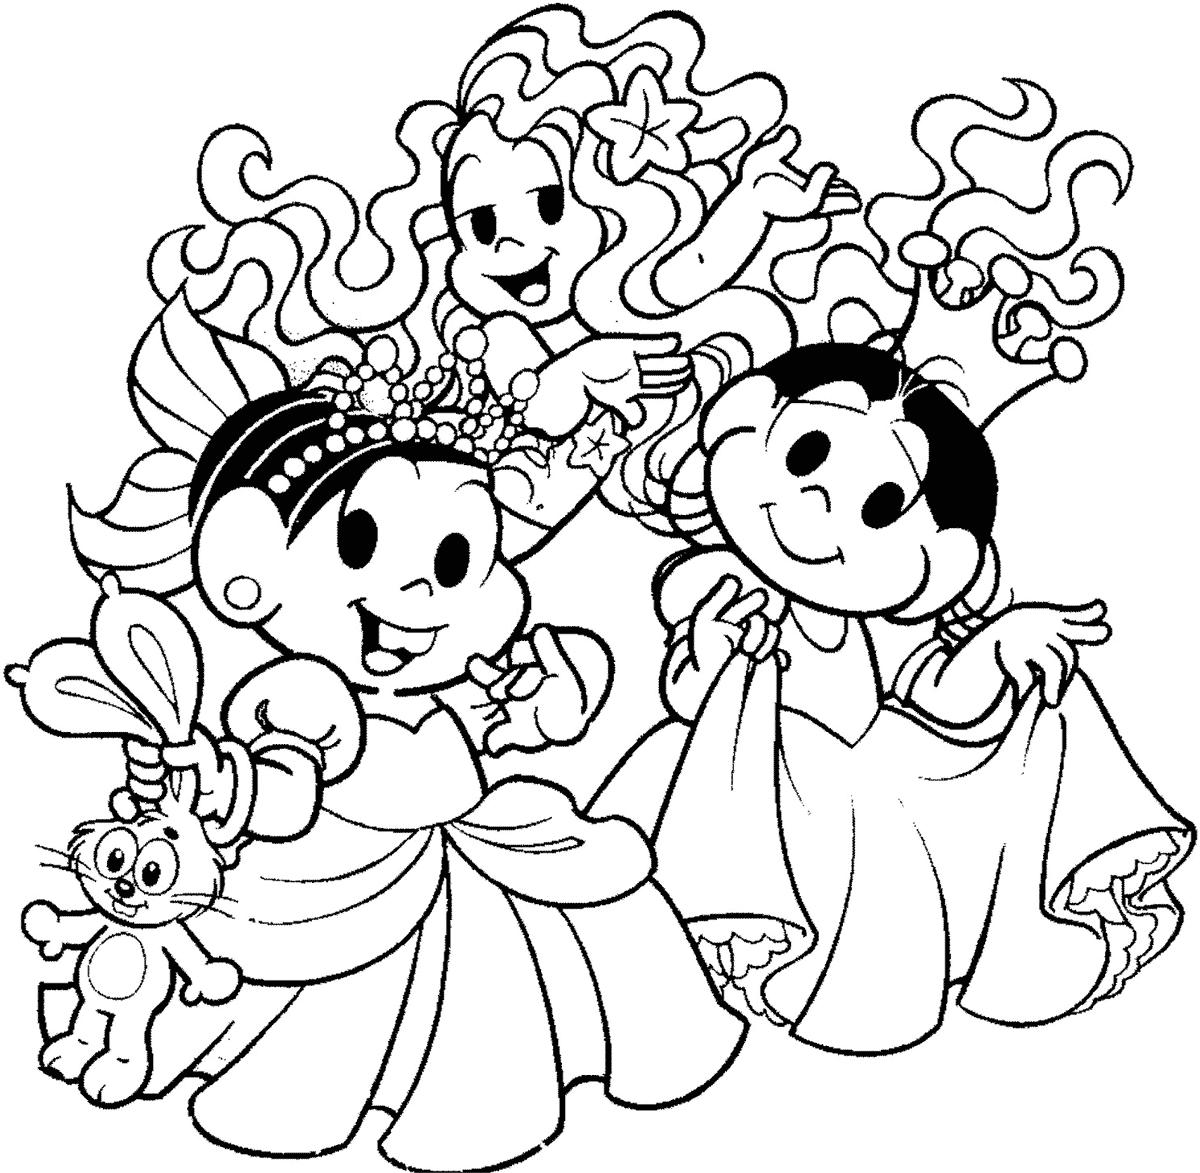 Princesas para Colorir e Imprimir  Muito Fcil  Colorir